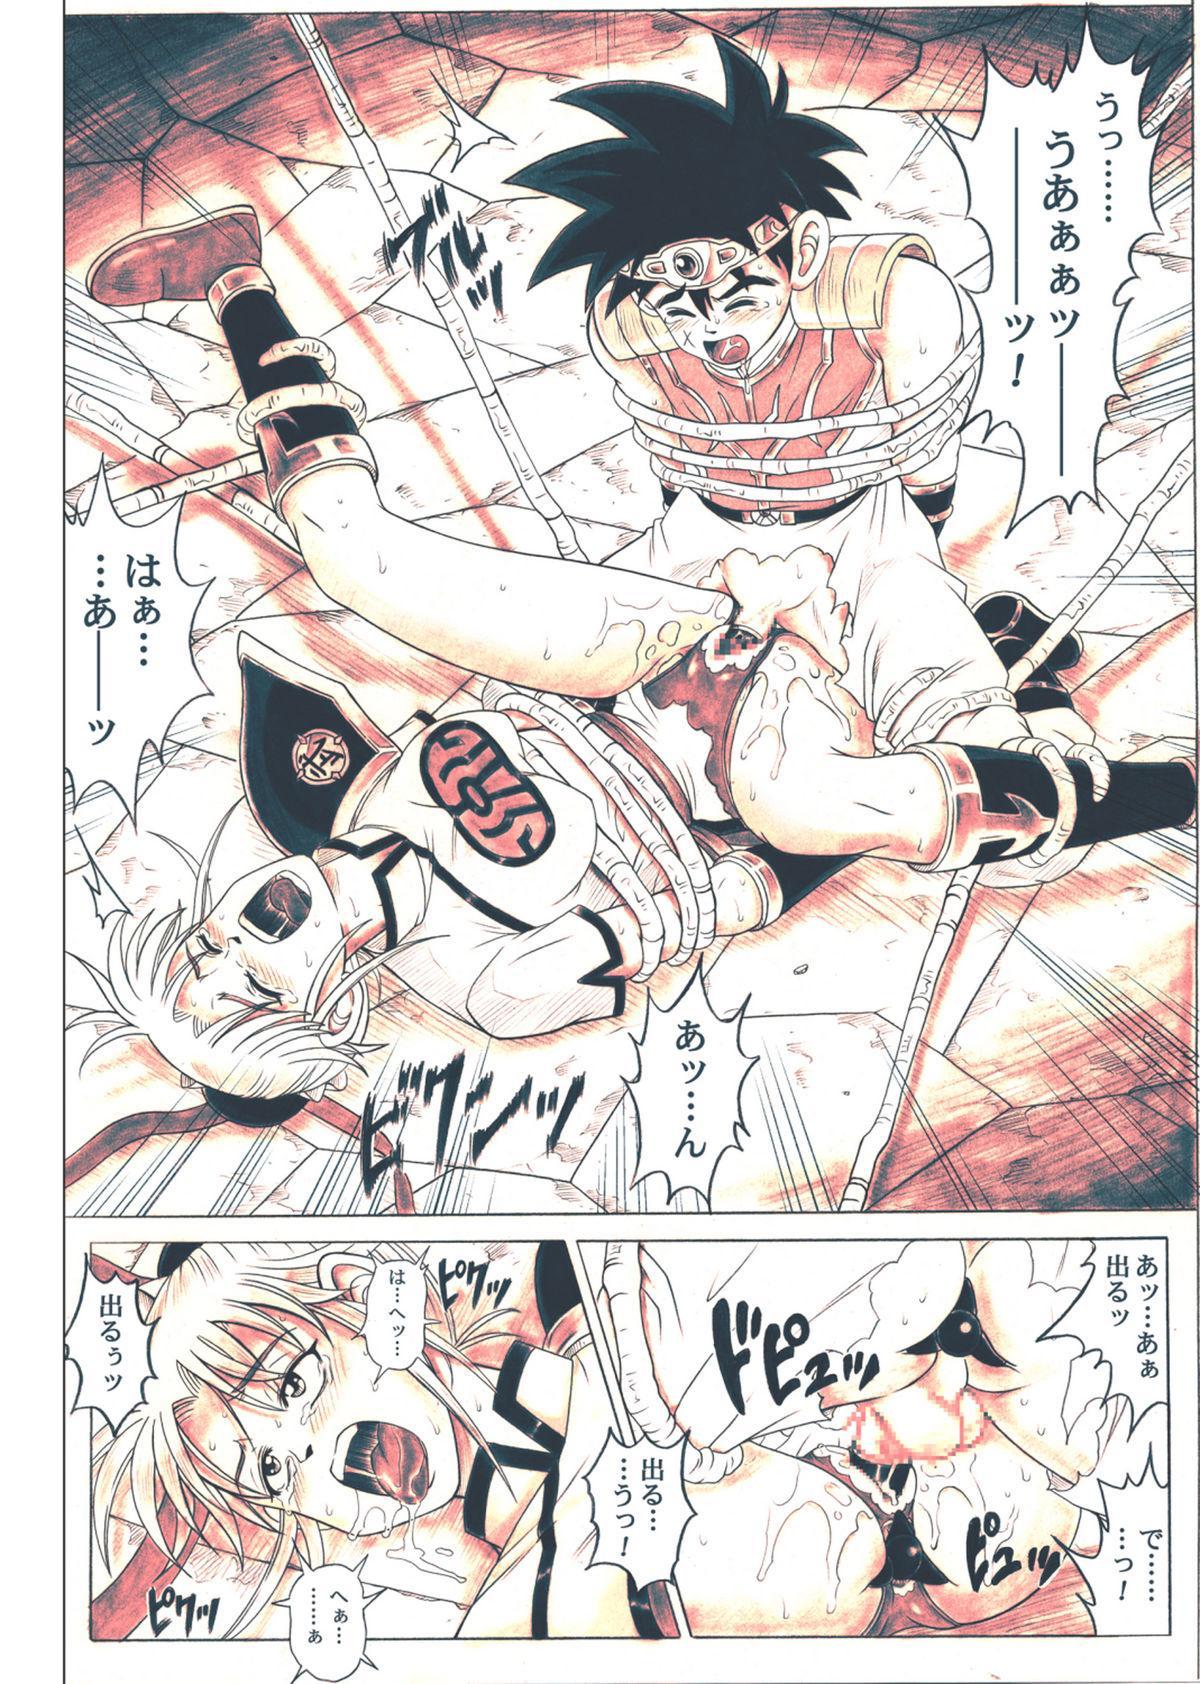 [Cyclone (Reizei, Izumi)] STAR TAC IDO ~Youkuso Haja no Doukutsu he~ Chuuhen Download edition (Dragon Warrior: Dai's Great Adventure) [Digital] 111